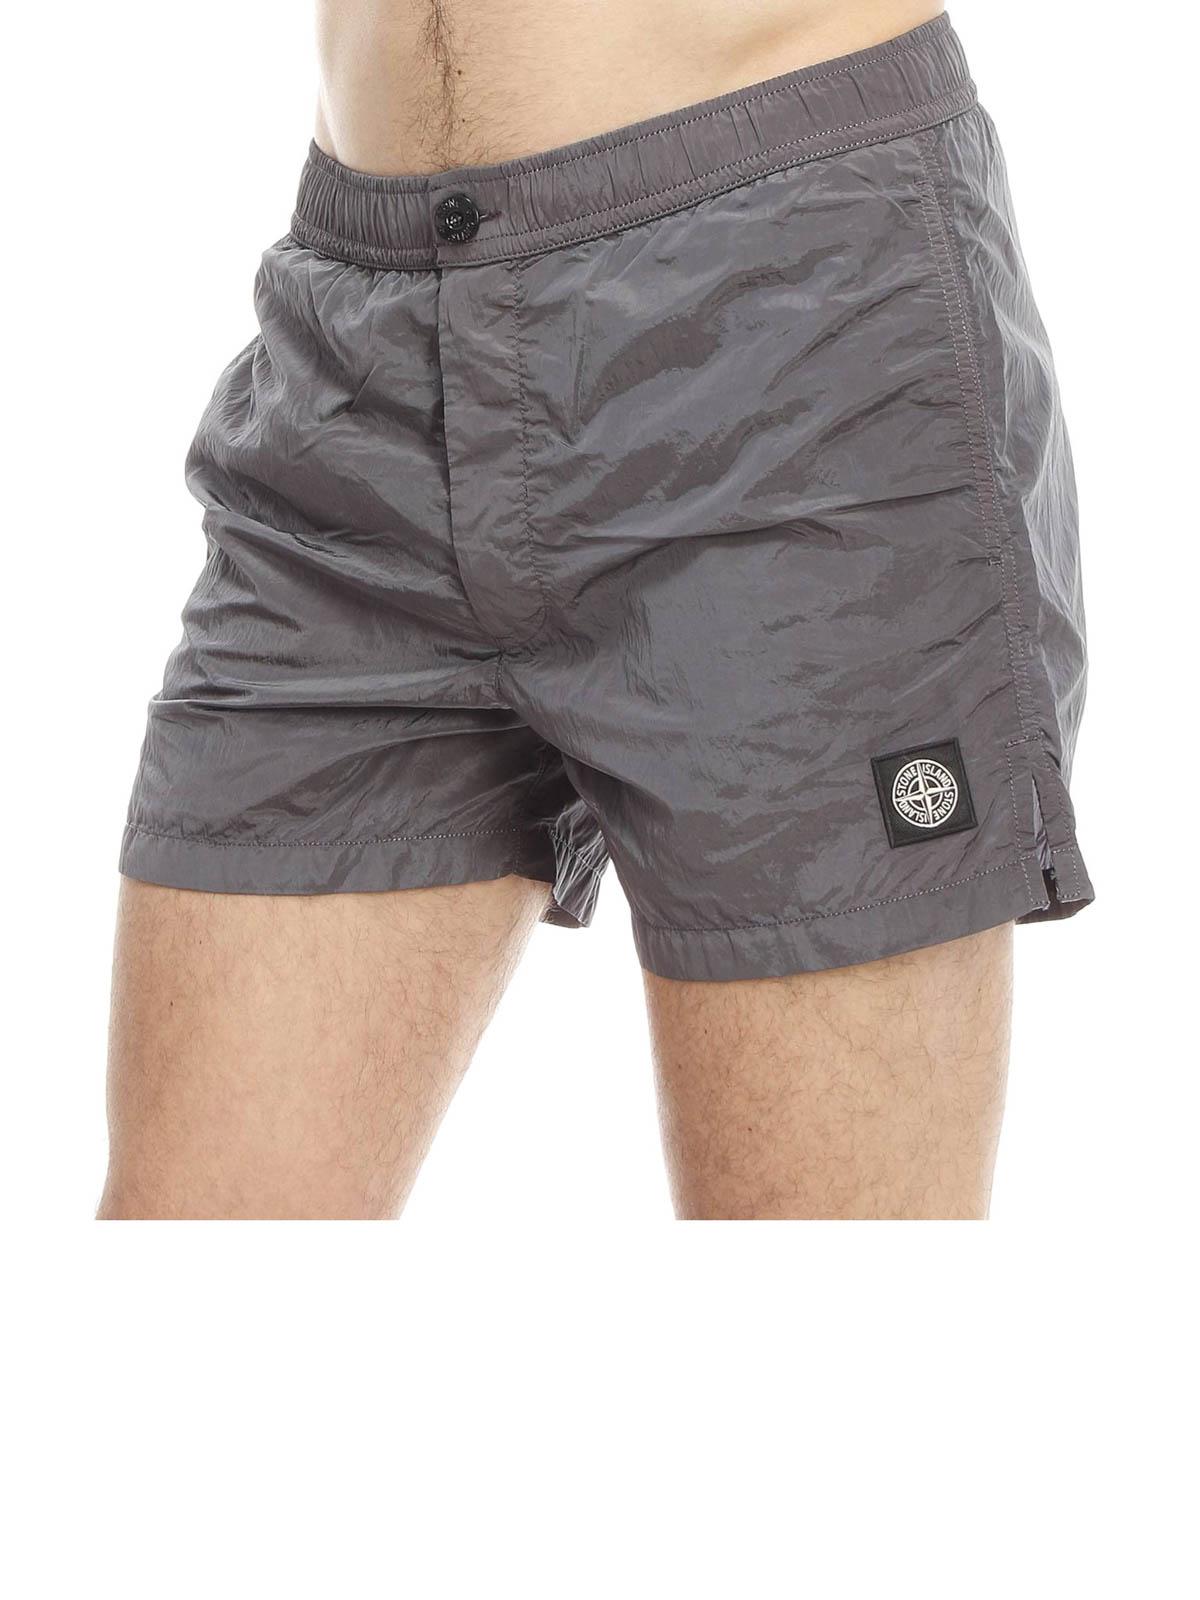 dd2d9c8c1234 iKRIX STONE ISLAND  Swim shorts   swimming trunks - Nylon swim shorts